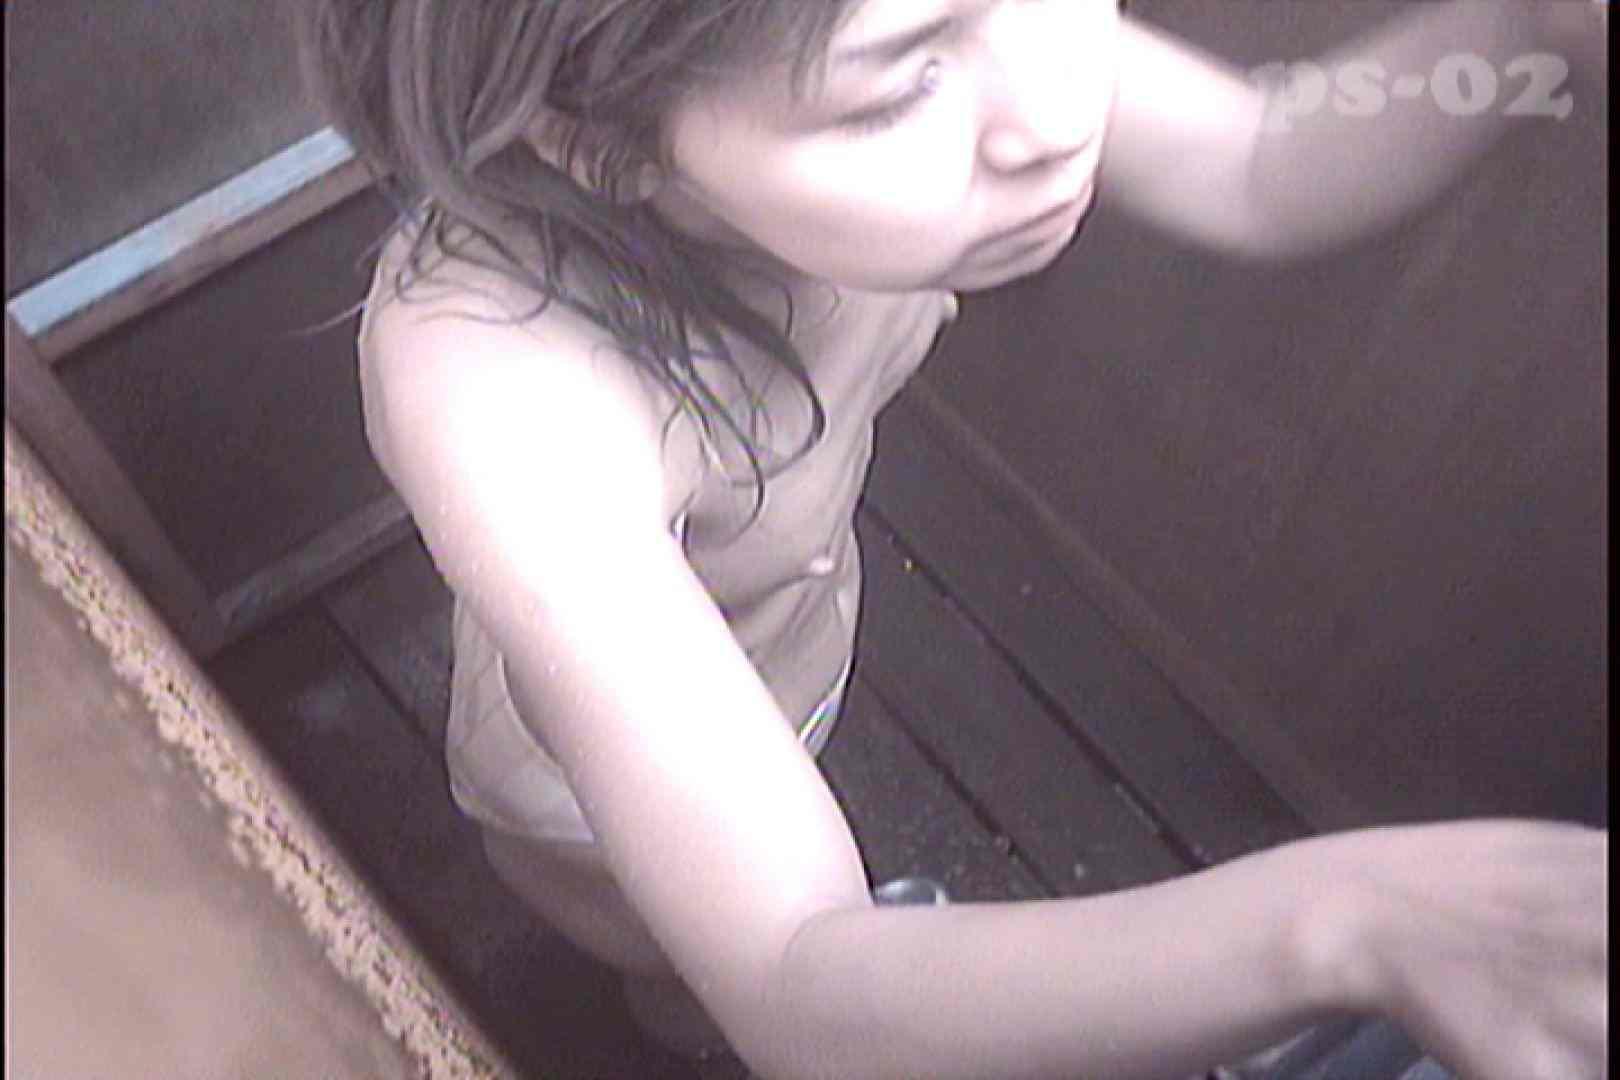 File.09 貧乳そして大きな乳首のお女市さん シャワーシーン おまんこ動画流出 98連発 53